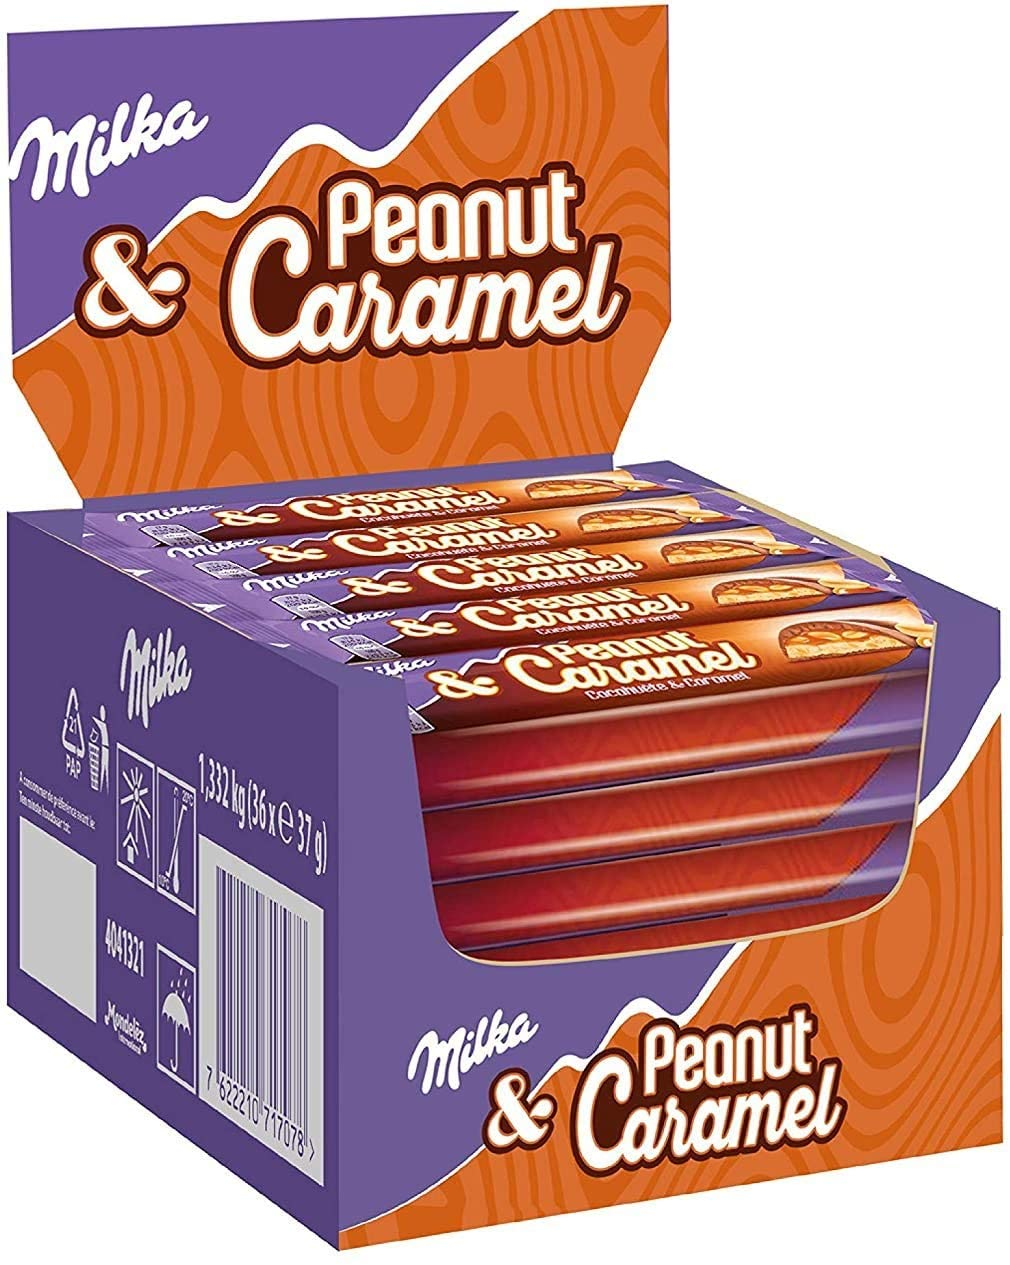 Milka peanut caramel 37g box of 36